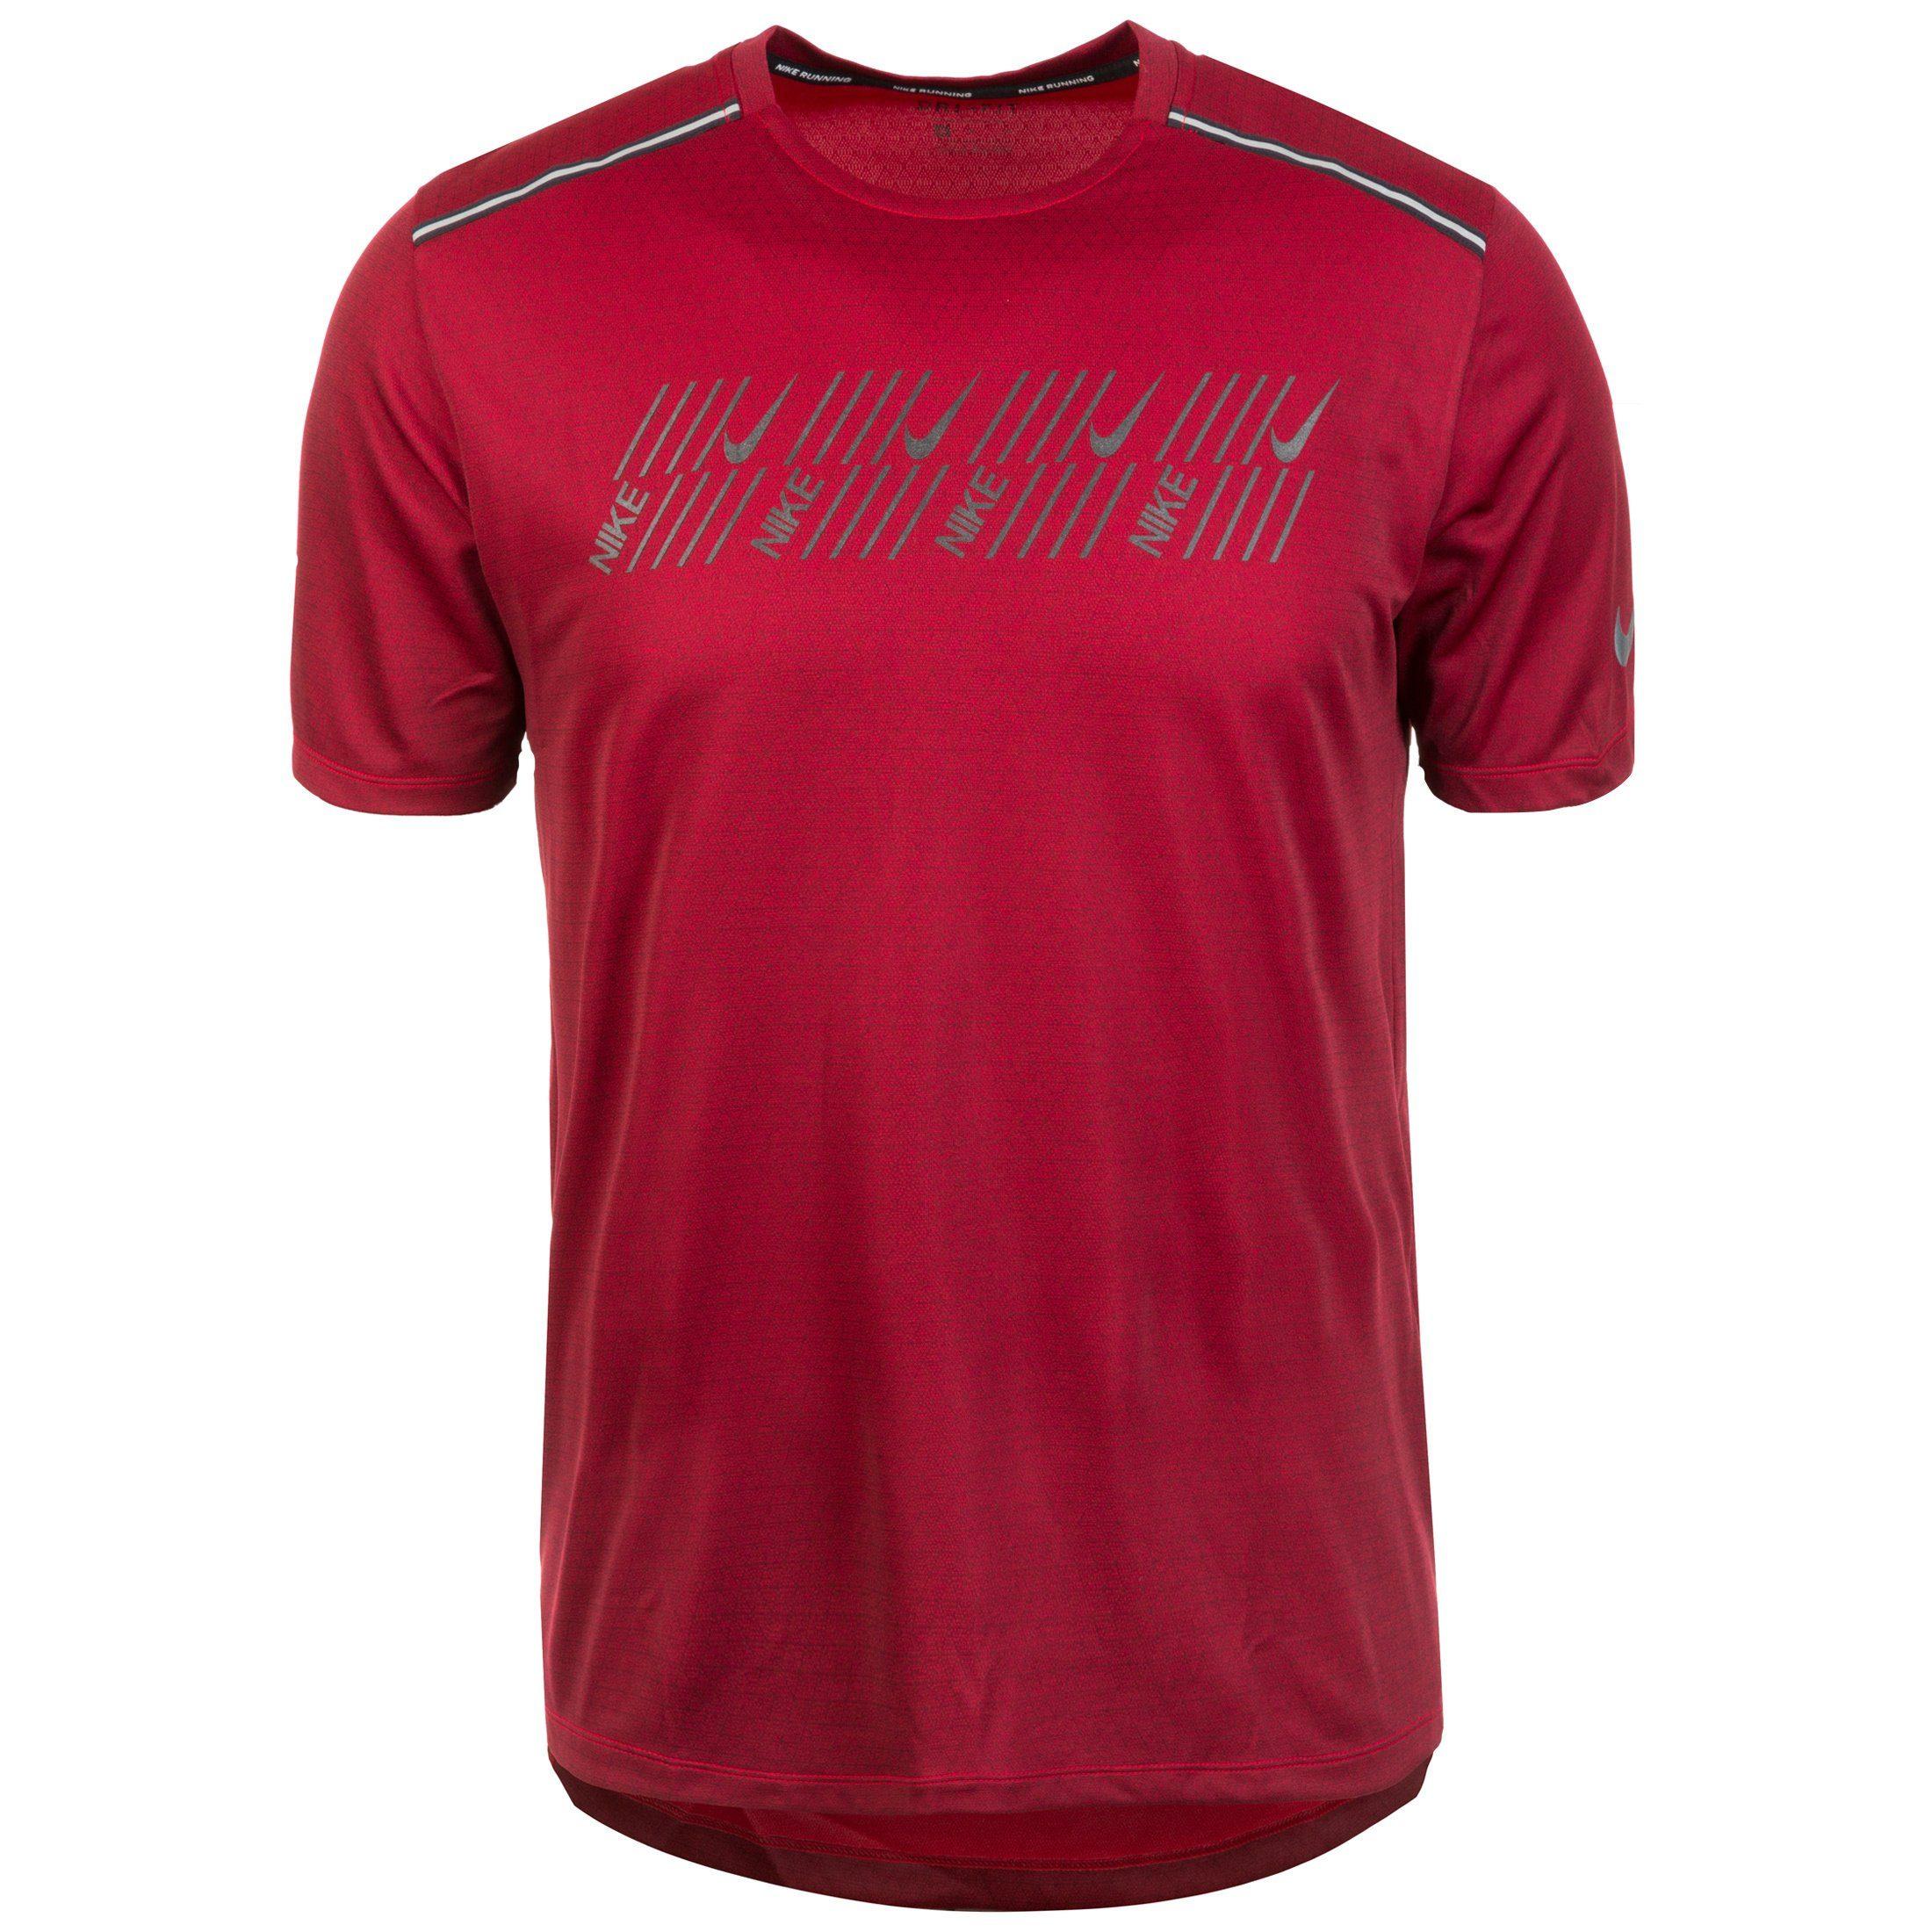 Nike Laufshirt Dri-fit Miler Tech Capsule   Sportbekleidung > Sportshirts > Laufshirts   Rot   Nike